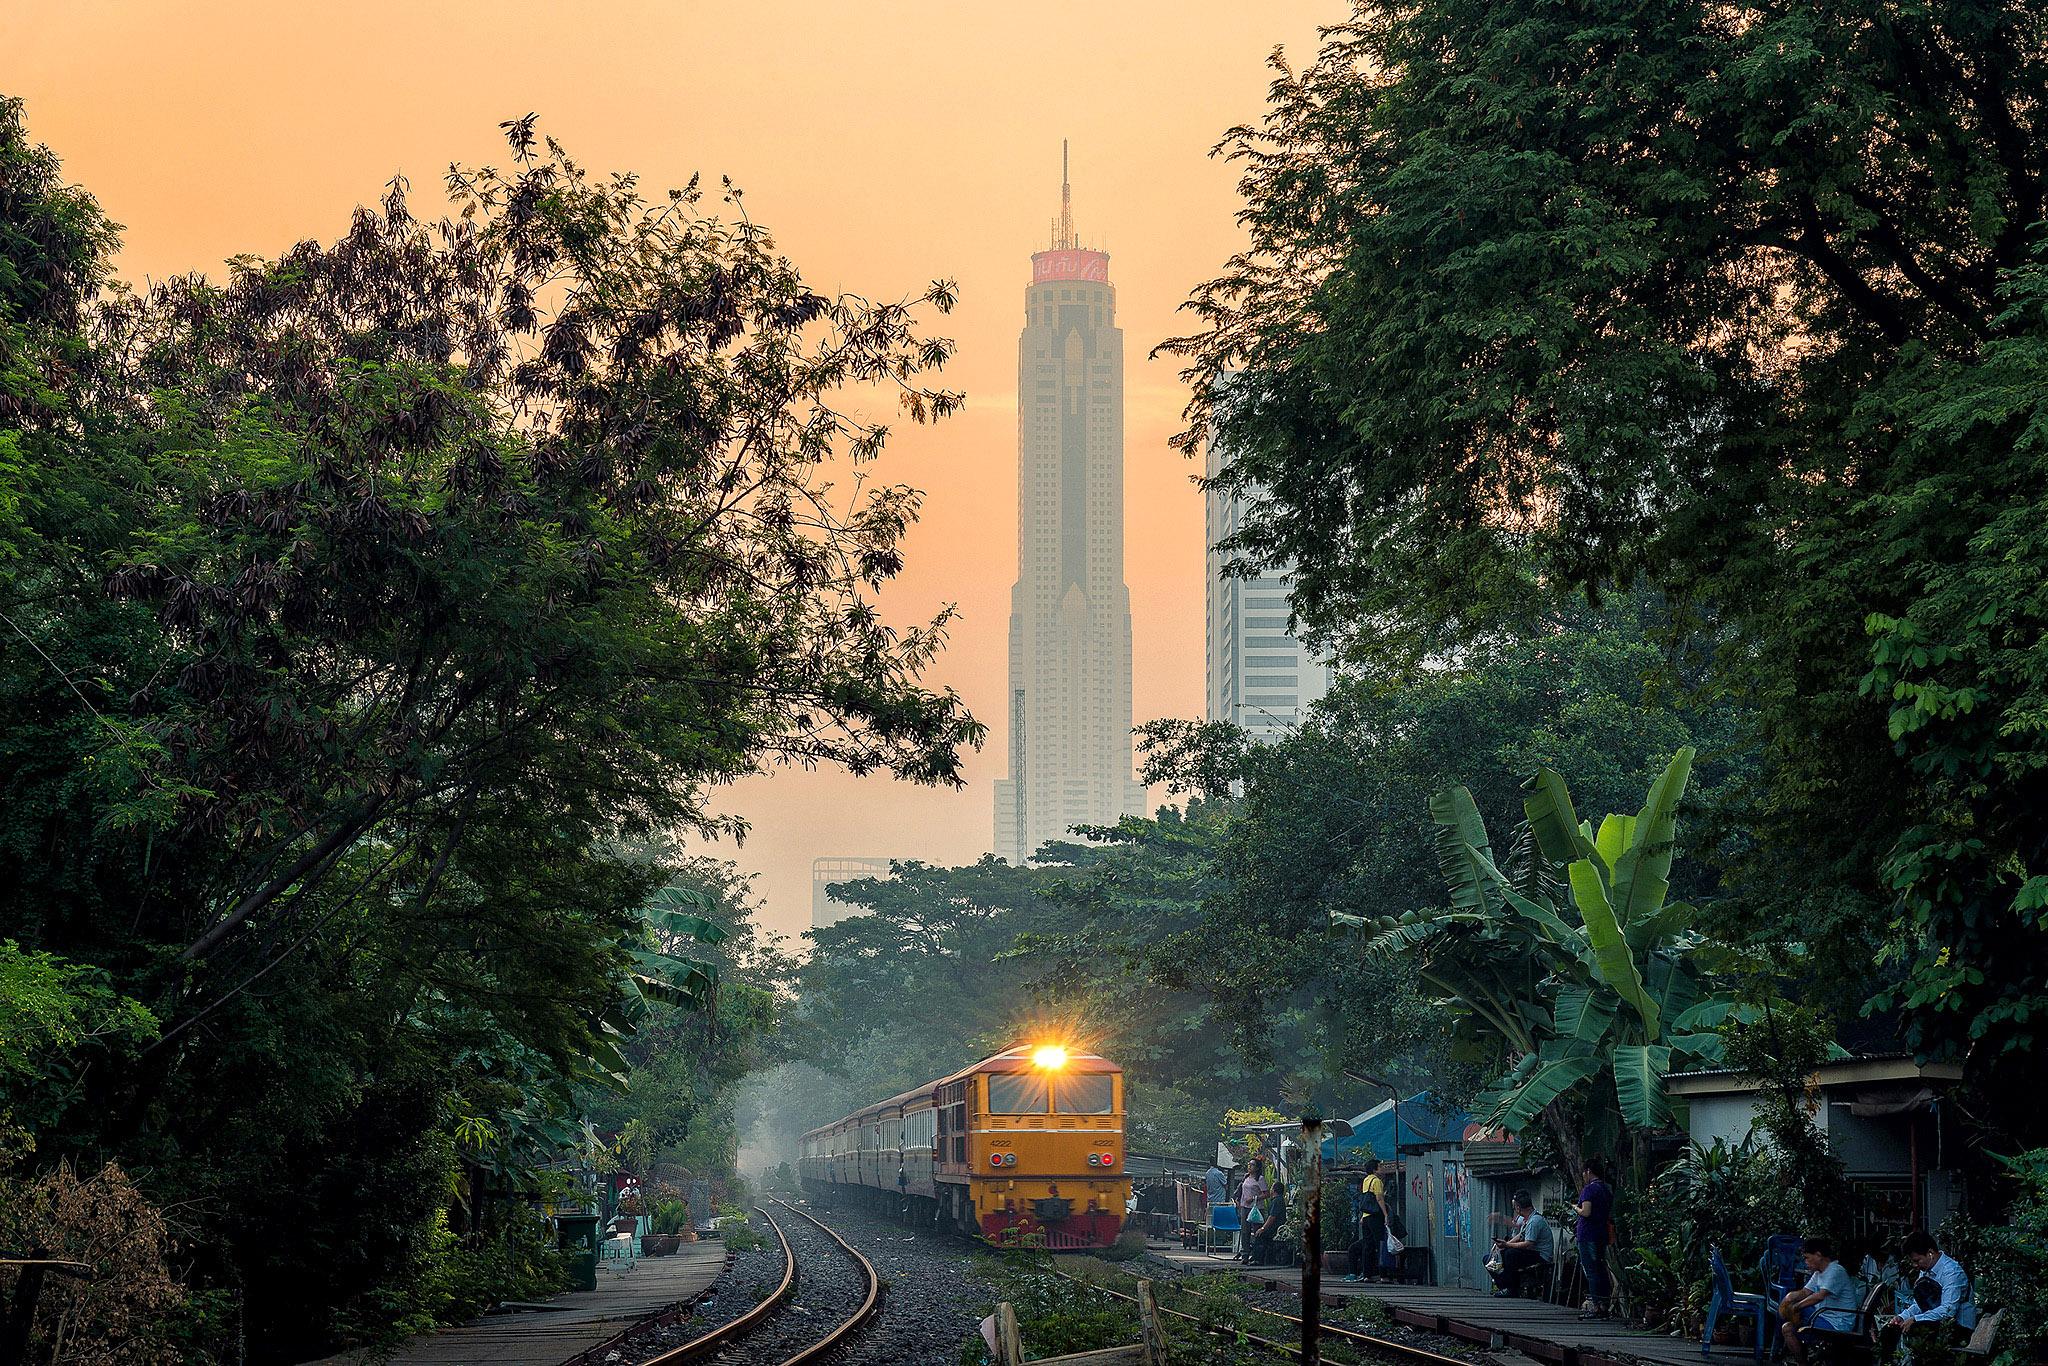 Baiyoke Tower II by Watcharin Ngamjitprapat 01.jpg